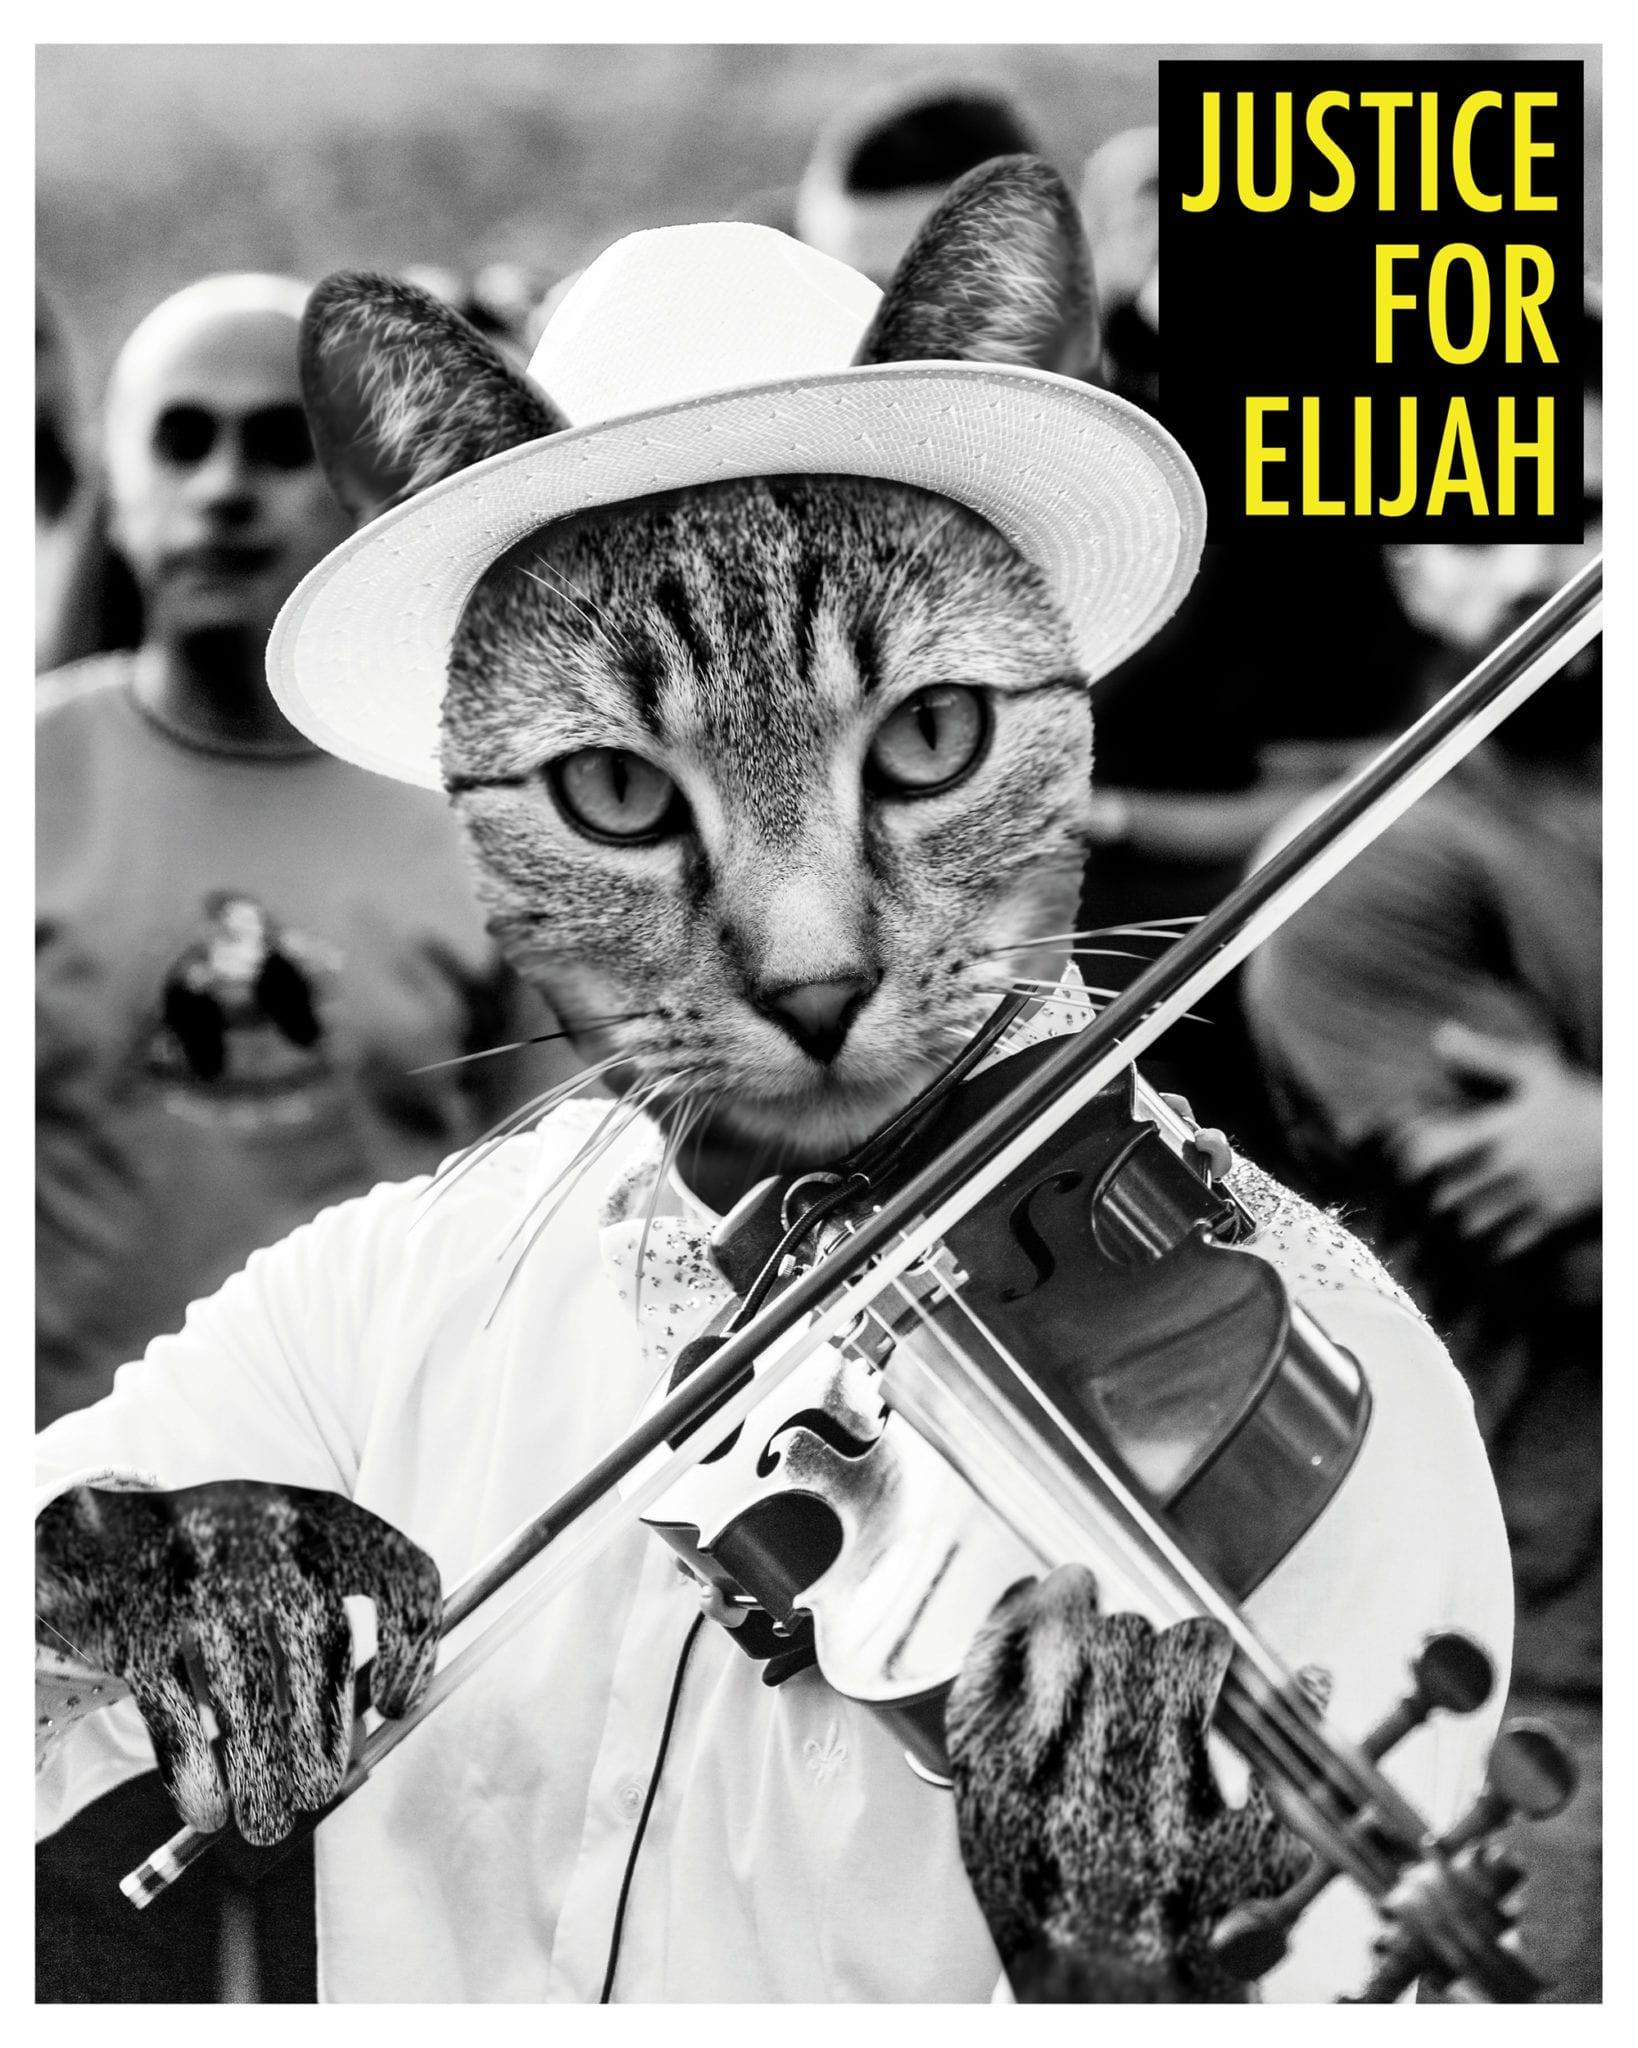 Justice for Elijah by Matt McCarthy